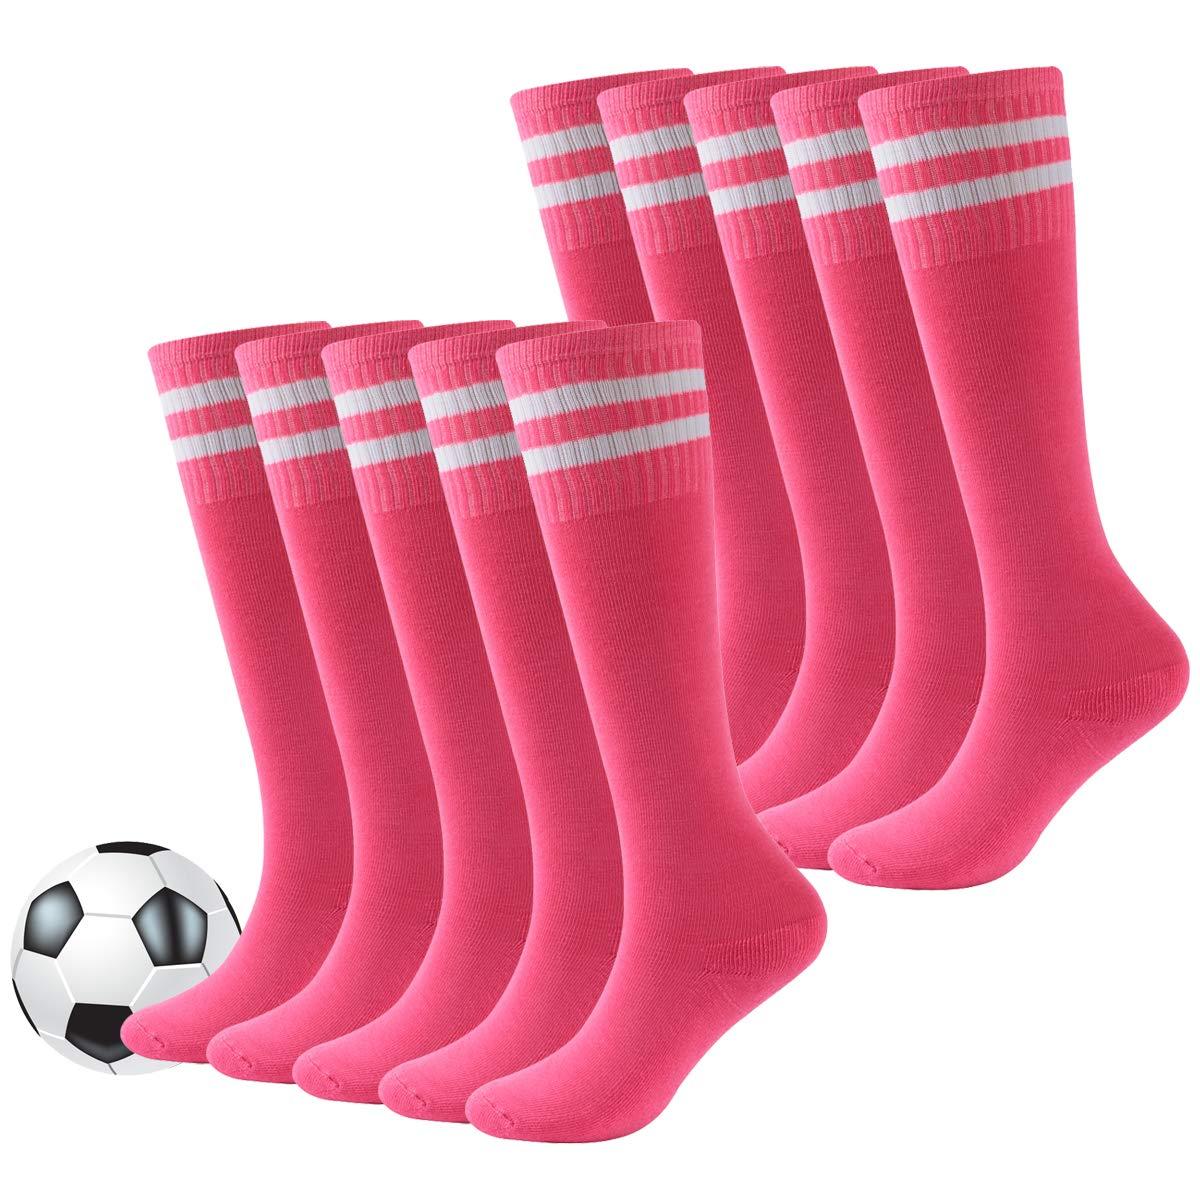 Baseball Socks for Youth,Children School Team Athletic Performance Knee High Stocking for Soccer,Football,Basketball Fasoar 10 Pairs Rose Red by Fasoar